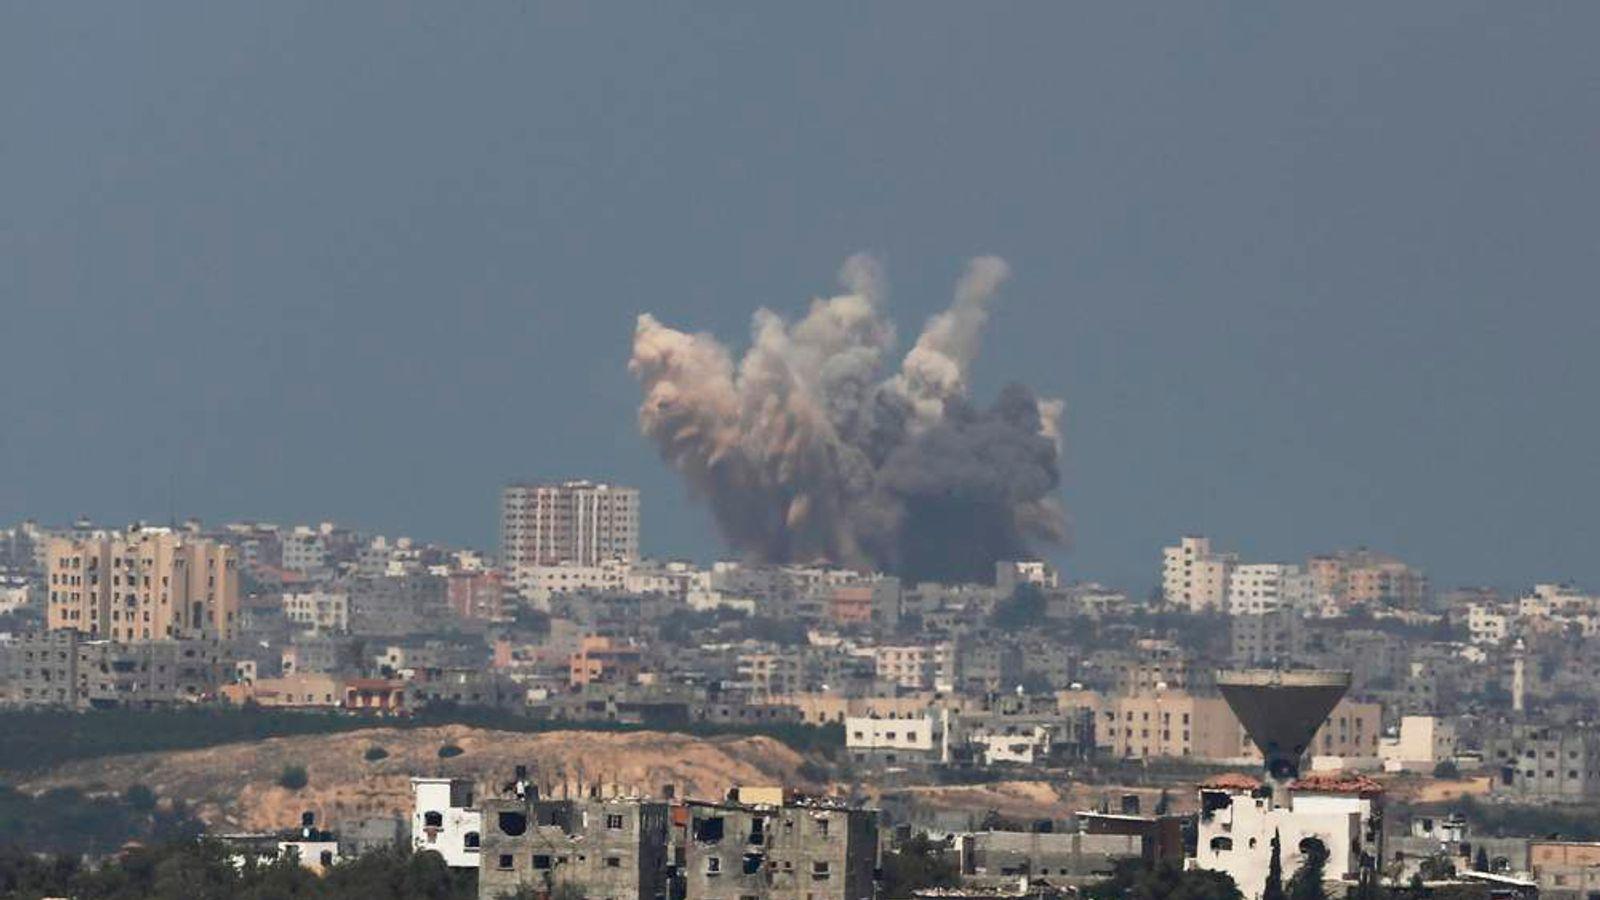 Smoke rises in the Gaza Strip after an Israeli strike